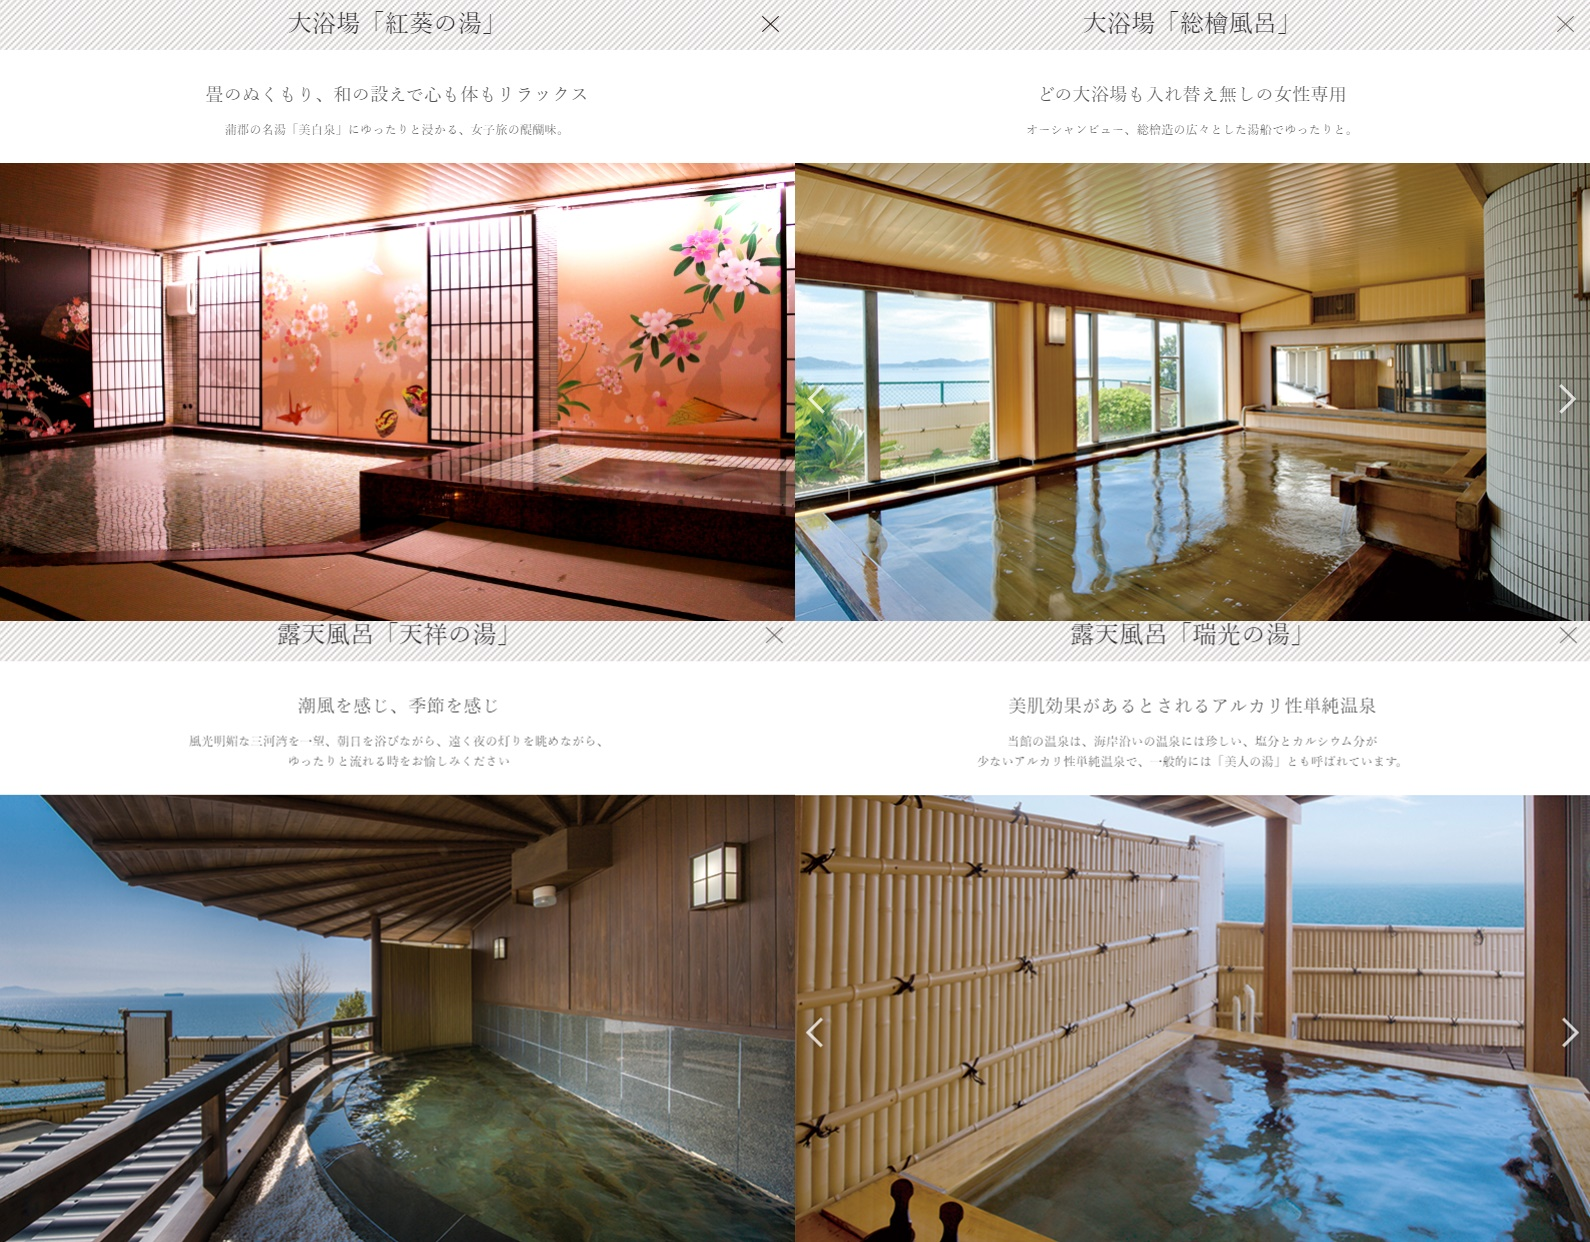 himeyado_hanakazasi_bath